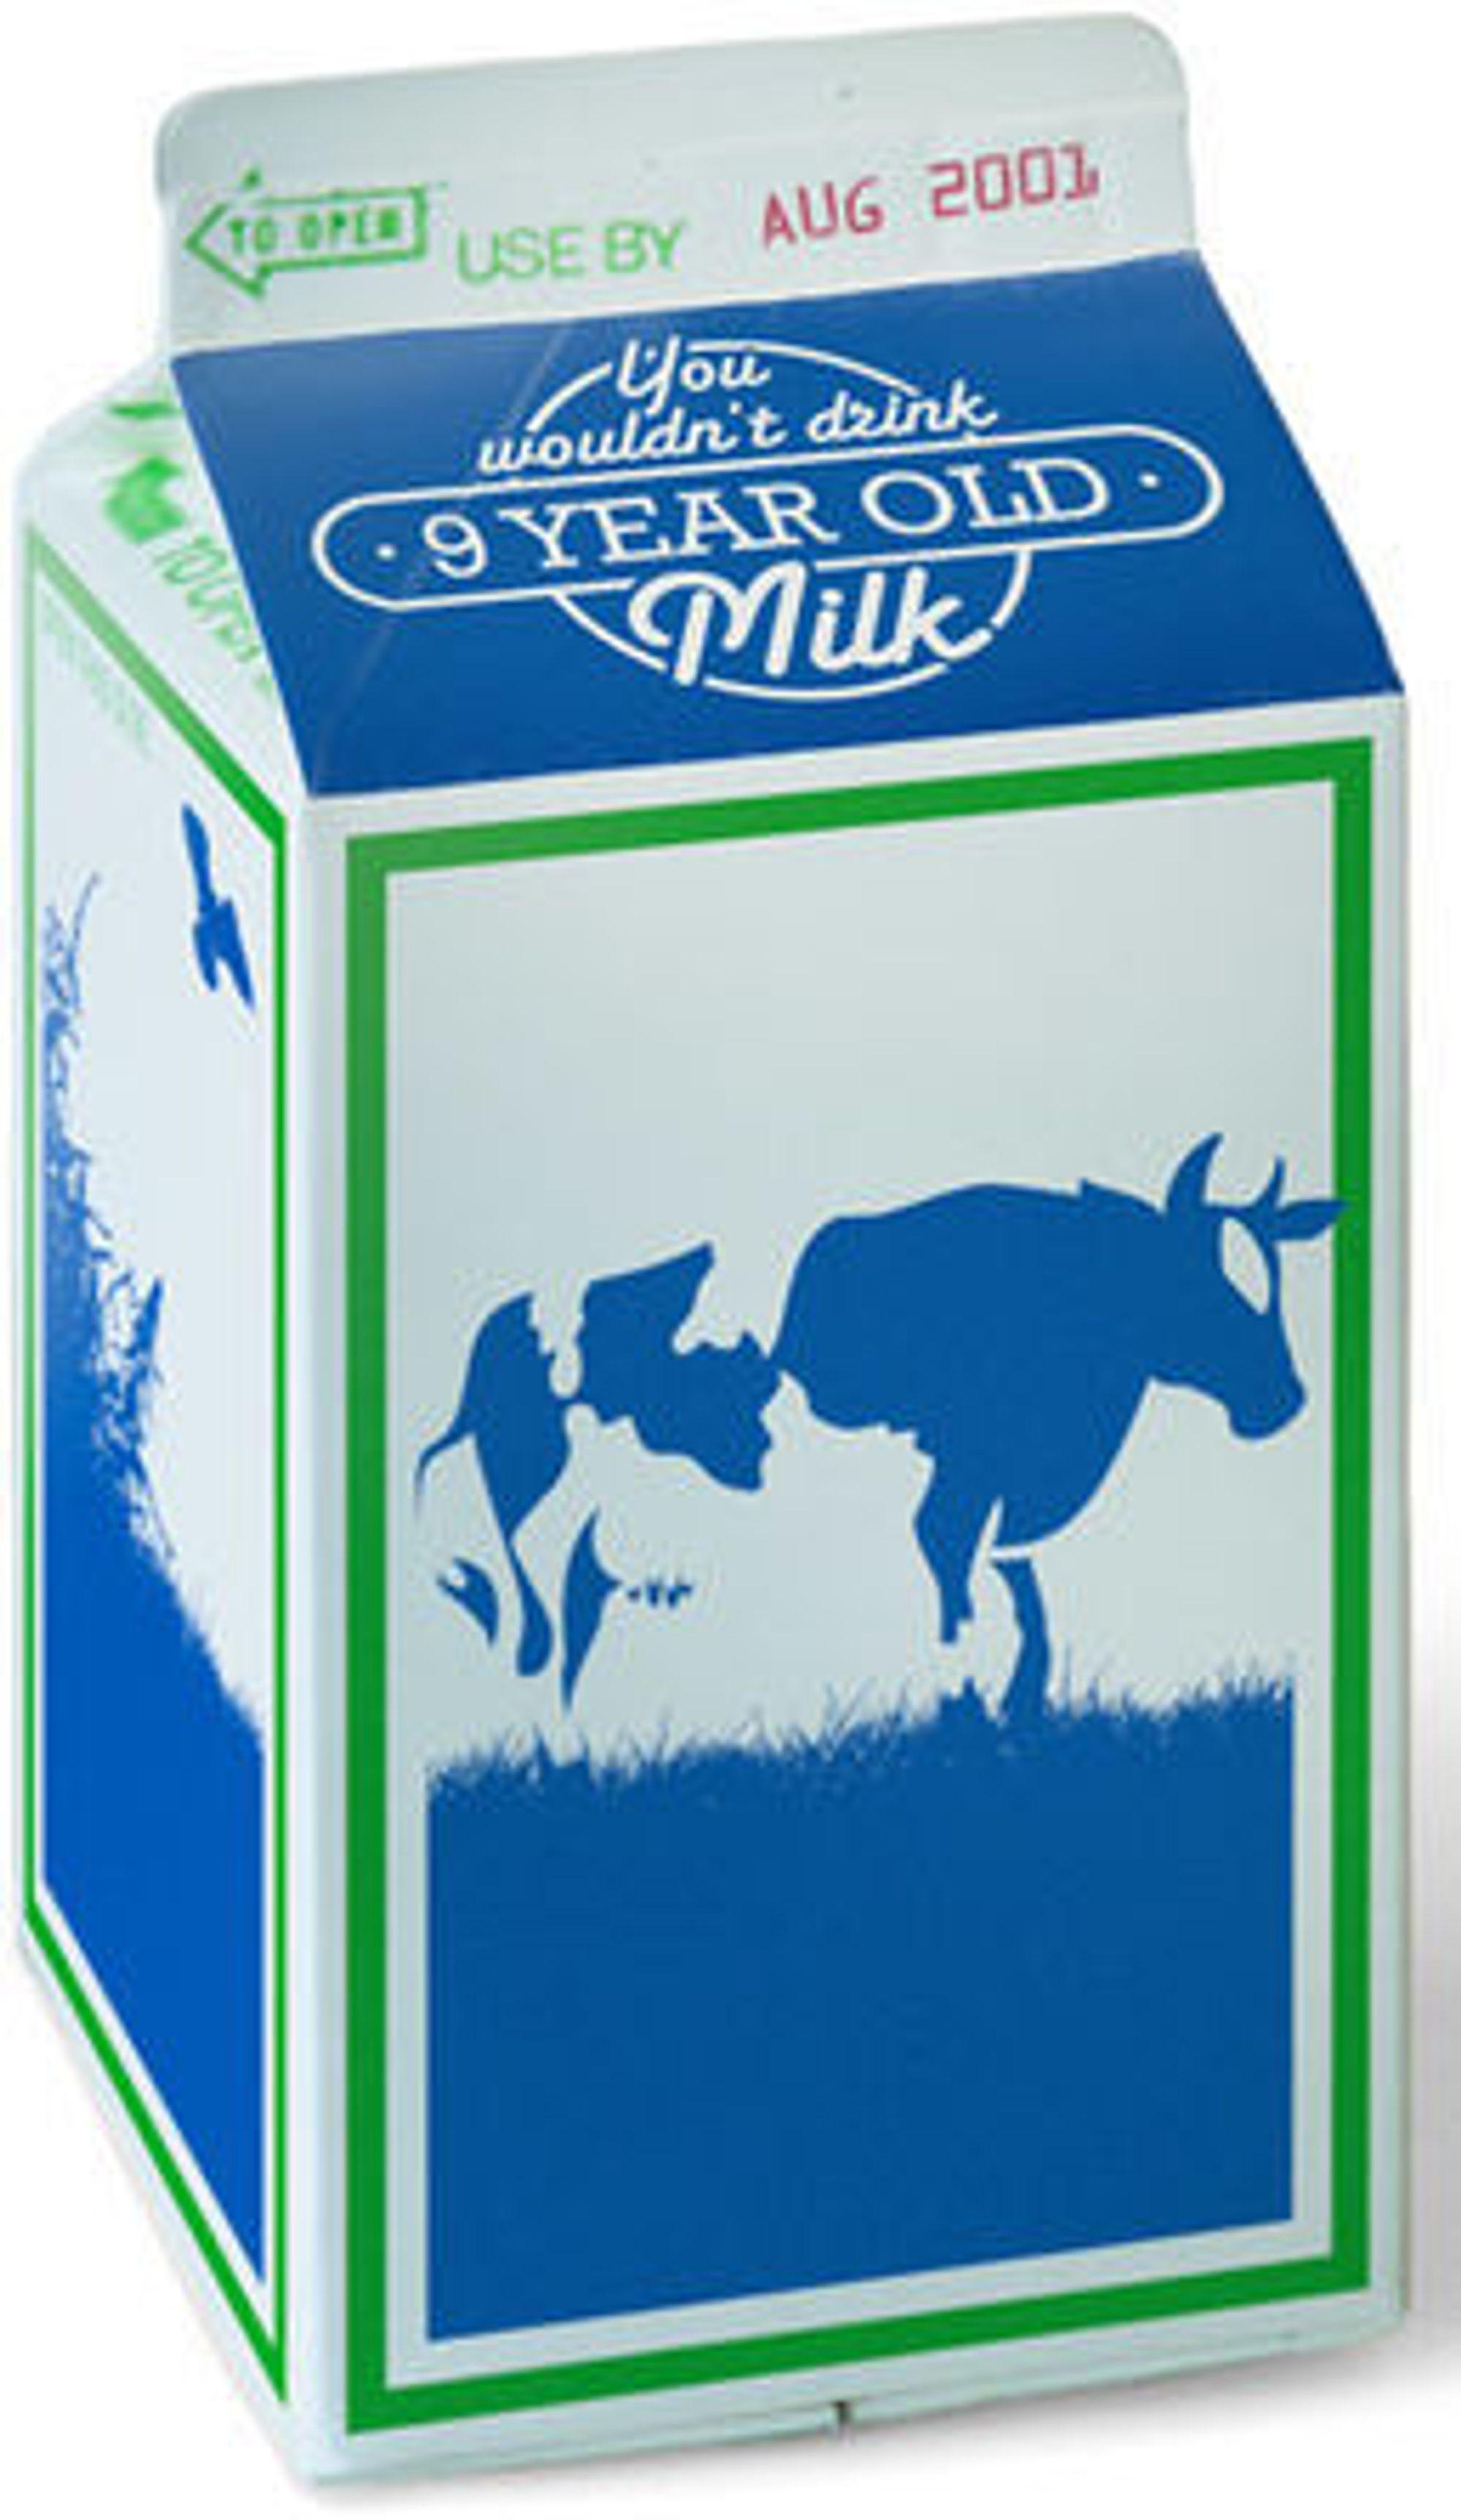 Microsoft sammenligner IE6 med ni år gammel melk.